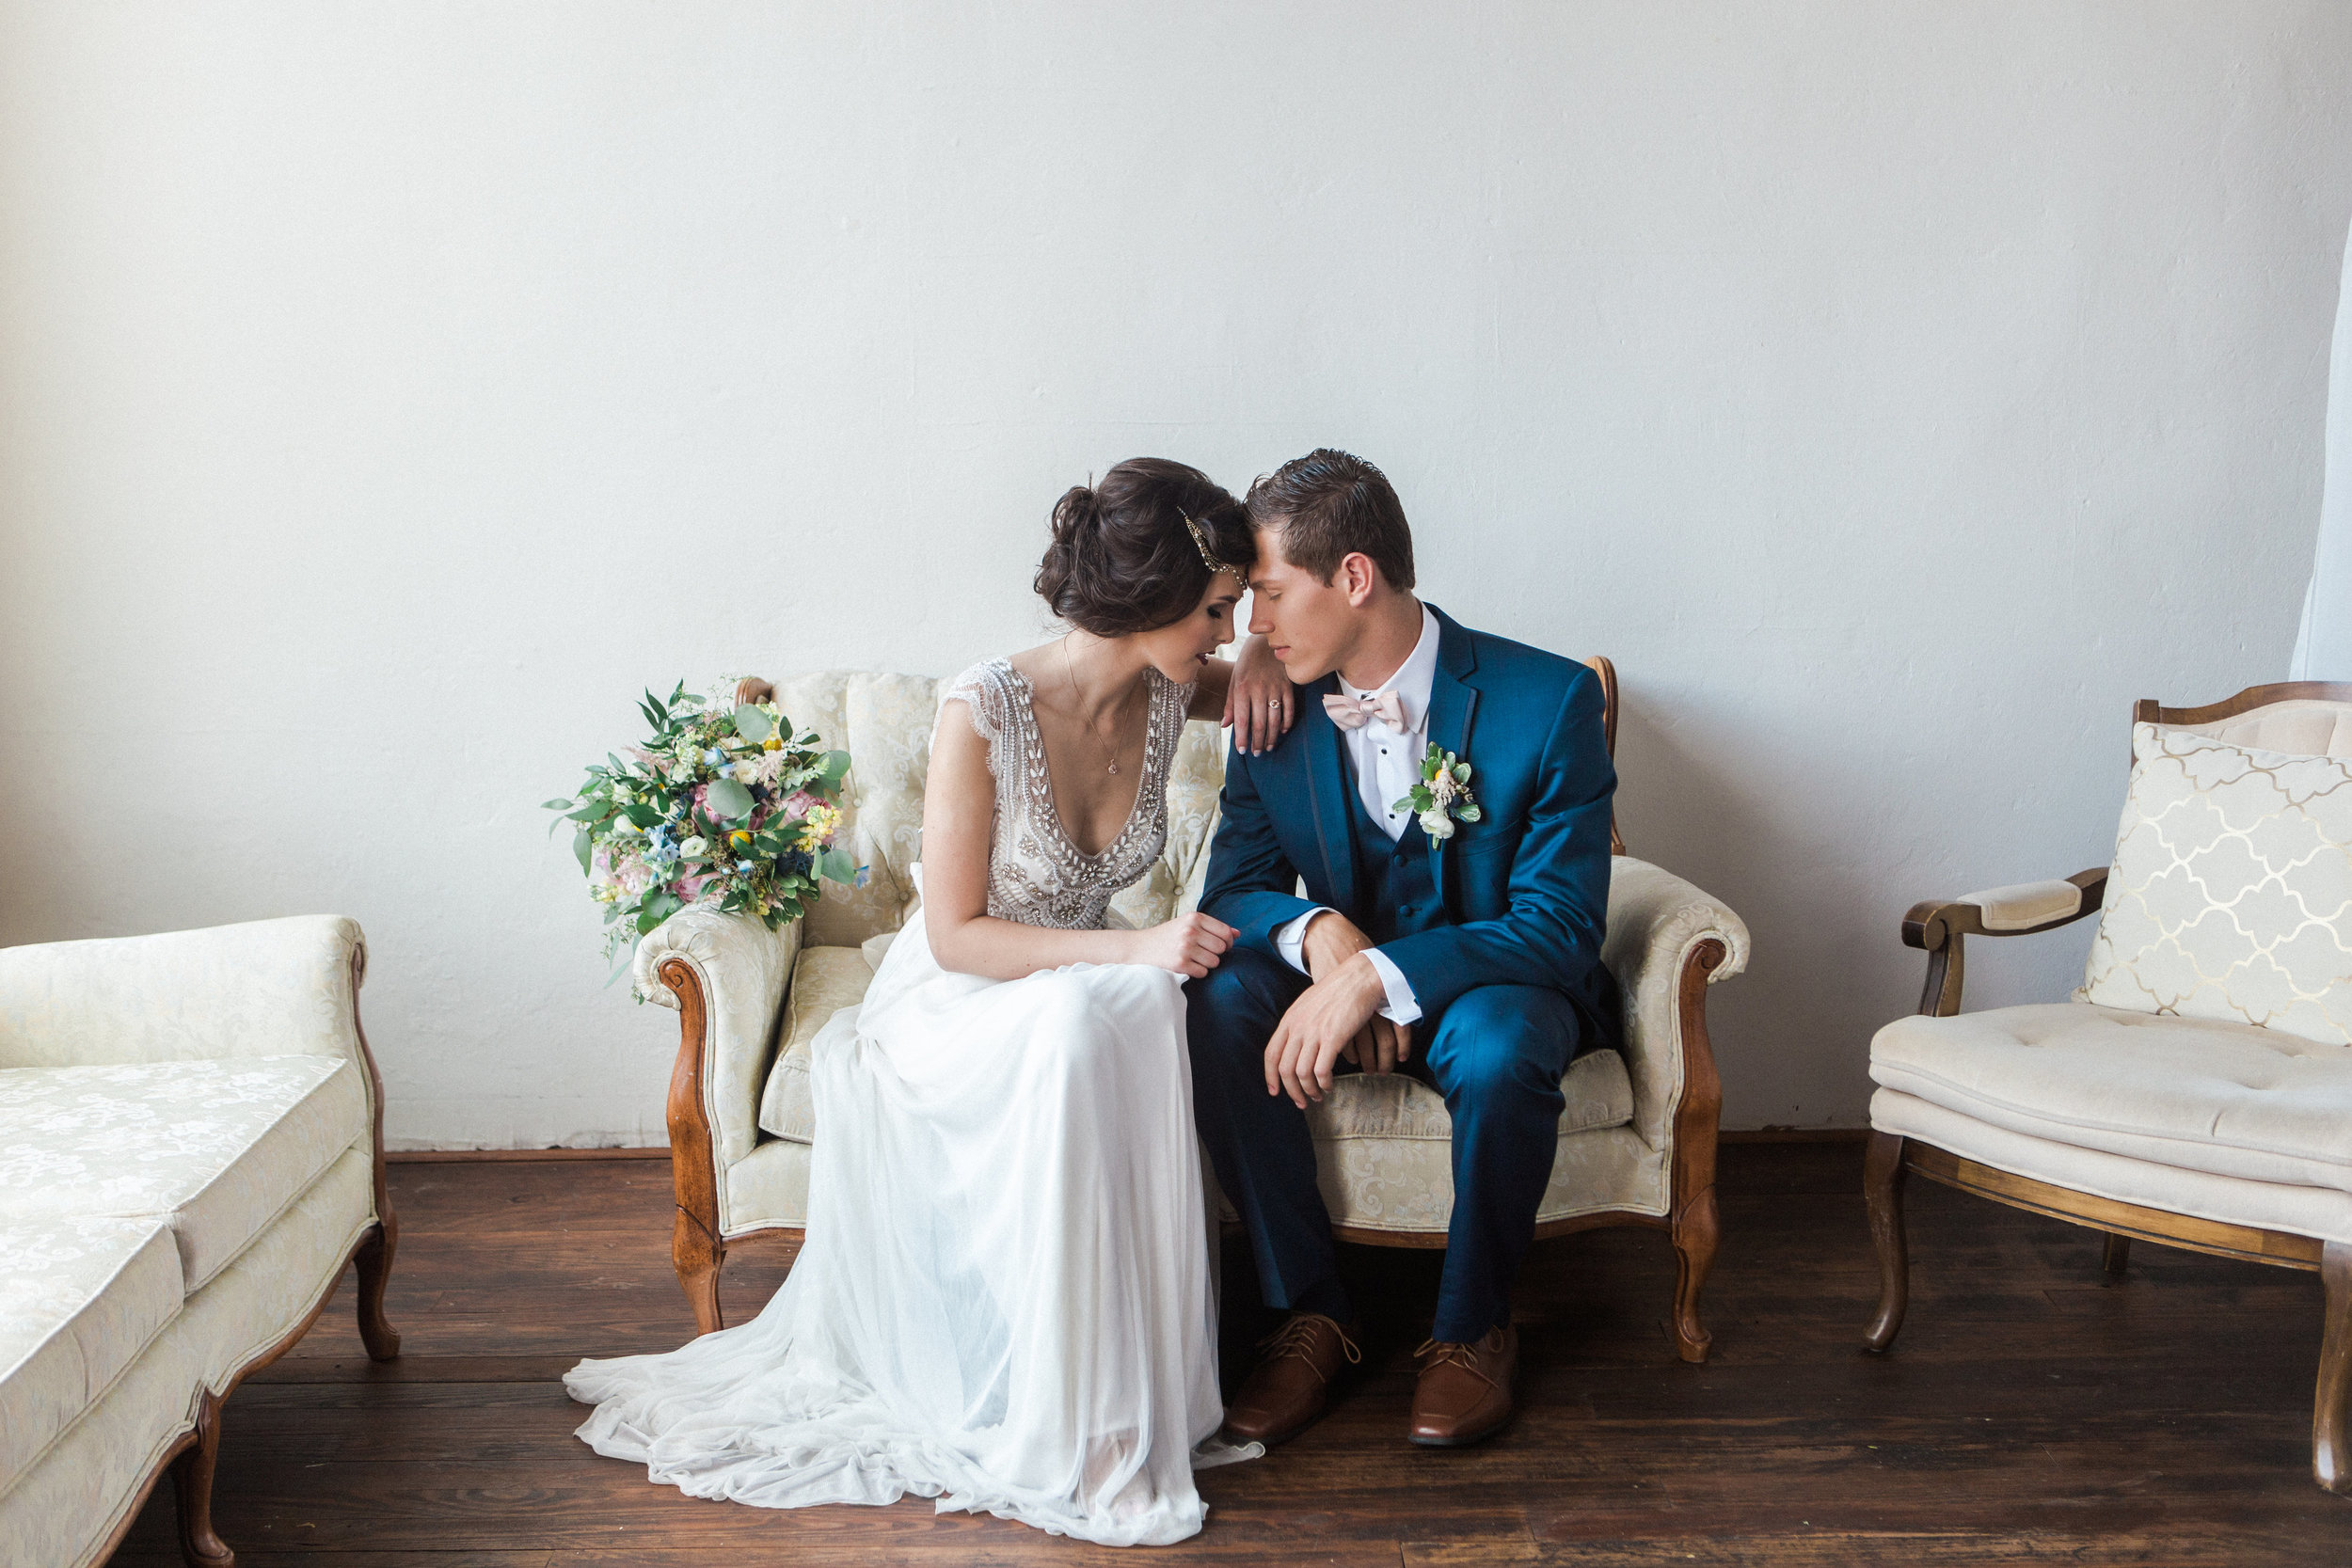 anna-campbell-coco-christa-o'brien-photography-the-corner-district-wedding-atlanta-wedding-savannah-bridal-boutique-ivory-and-beau-bridal-boutique-savannah-bridal-gowns-savannah-bridal-atlanta-bridal-boutique-borrowed-and-blue-12.jpg